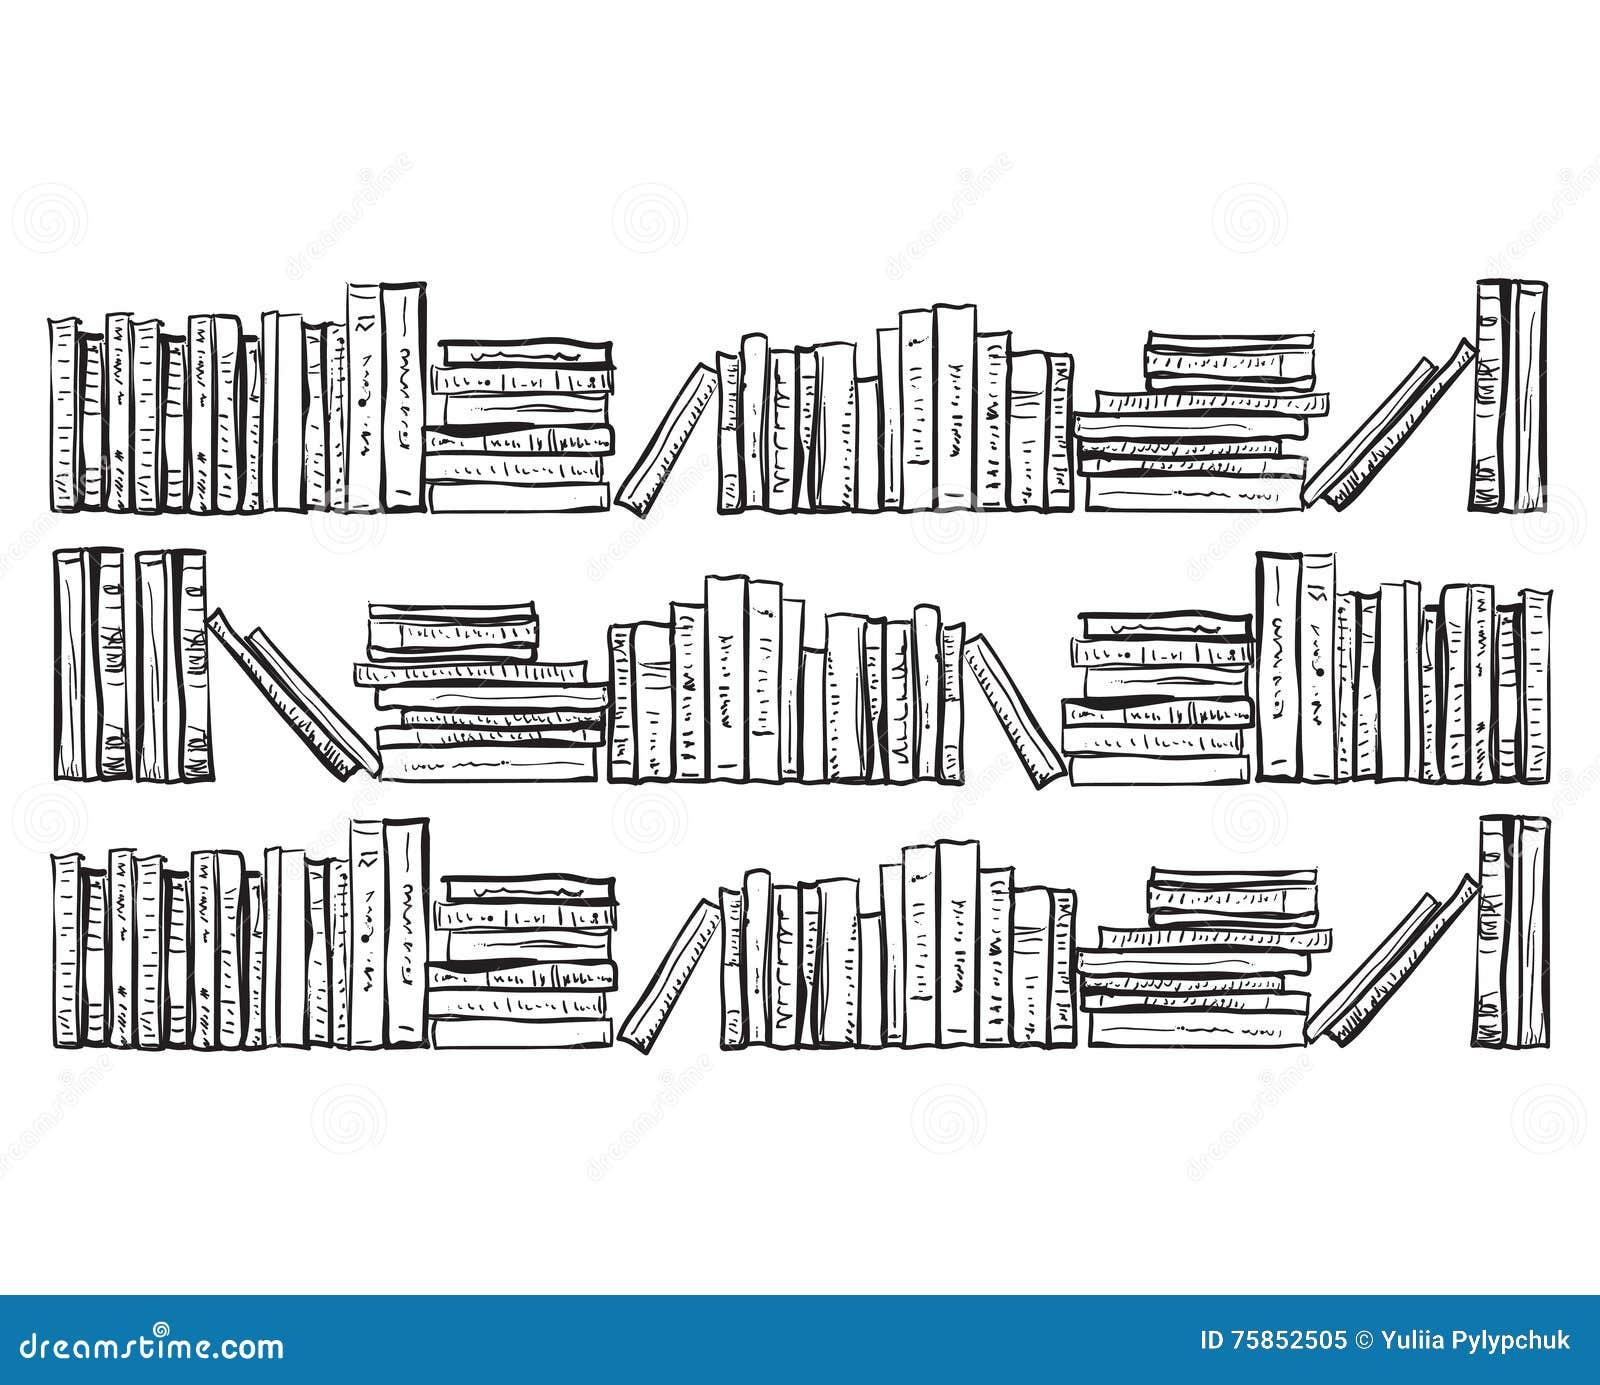 Bokhyllan books lott